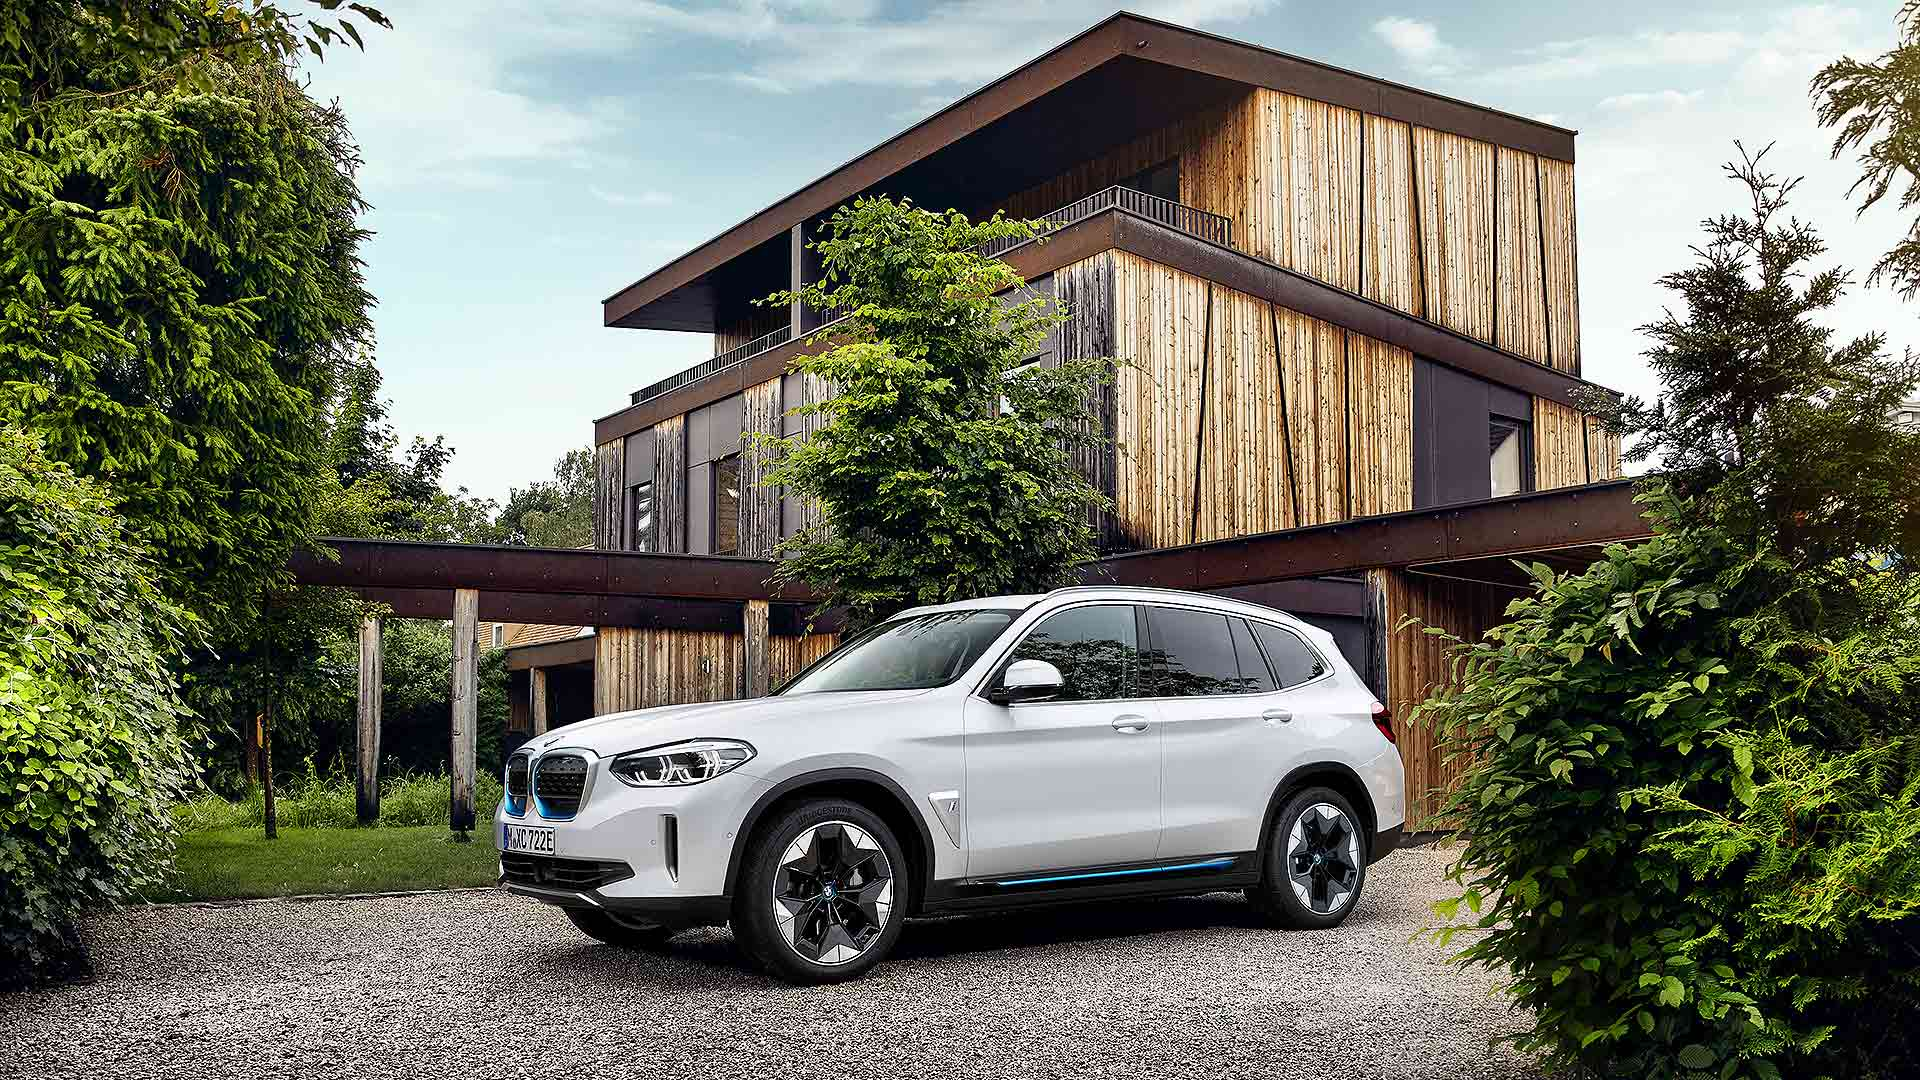 New BMW ix3 electric SUV